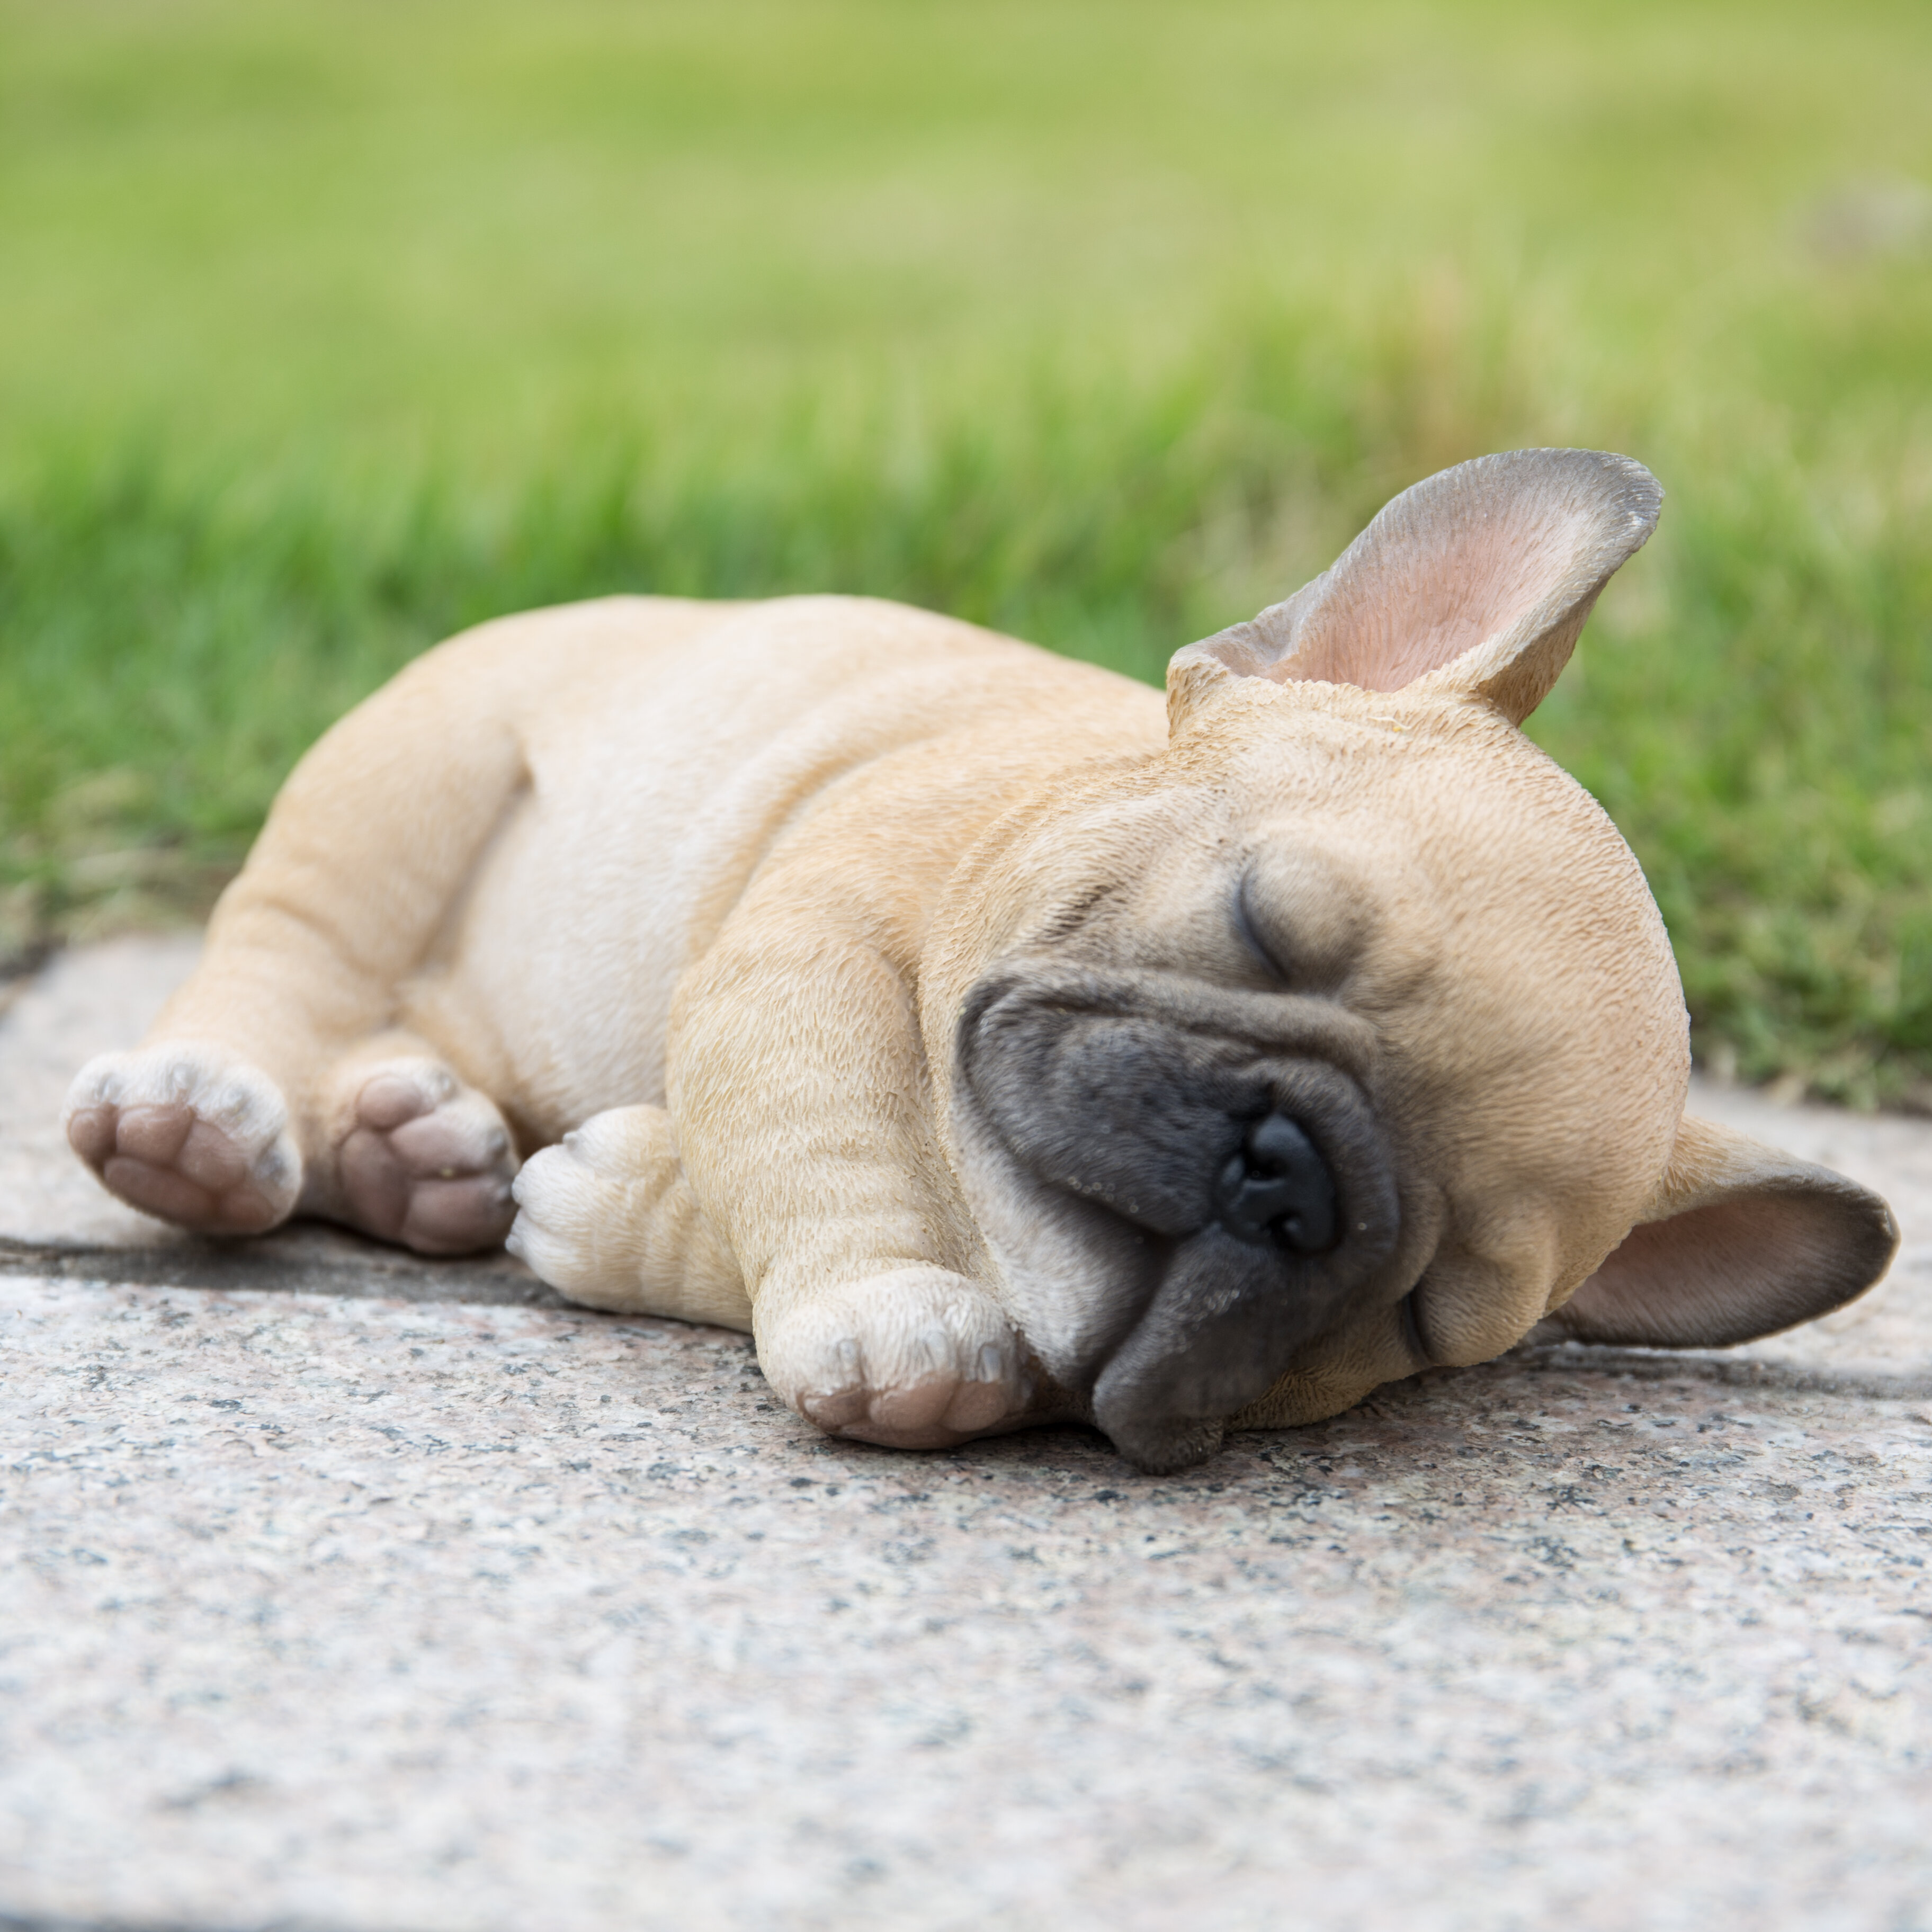 Sleeping French Bulldog Statue Figurine Life Like Realistic Garden Decor New